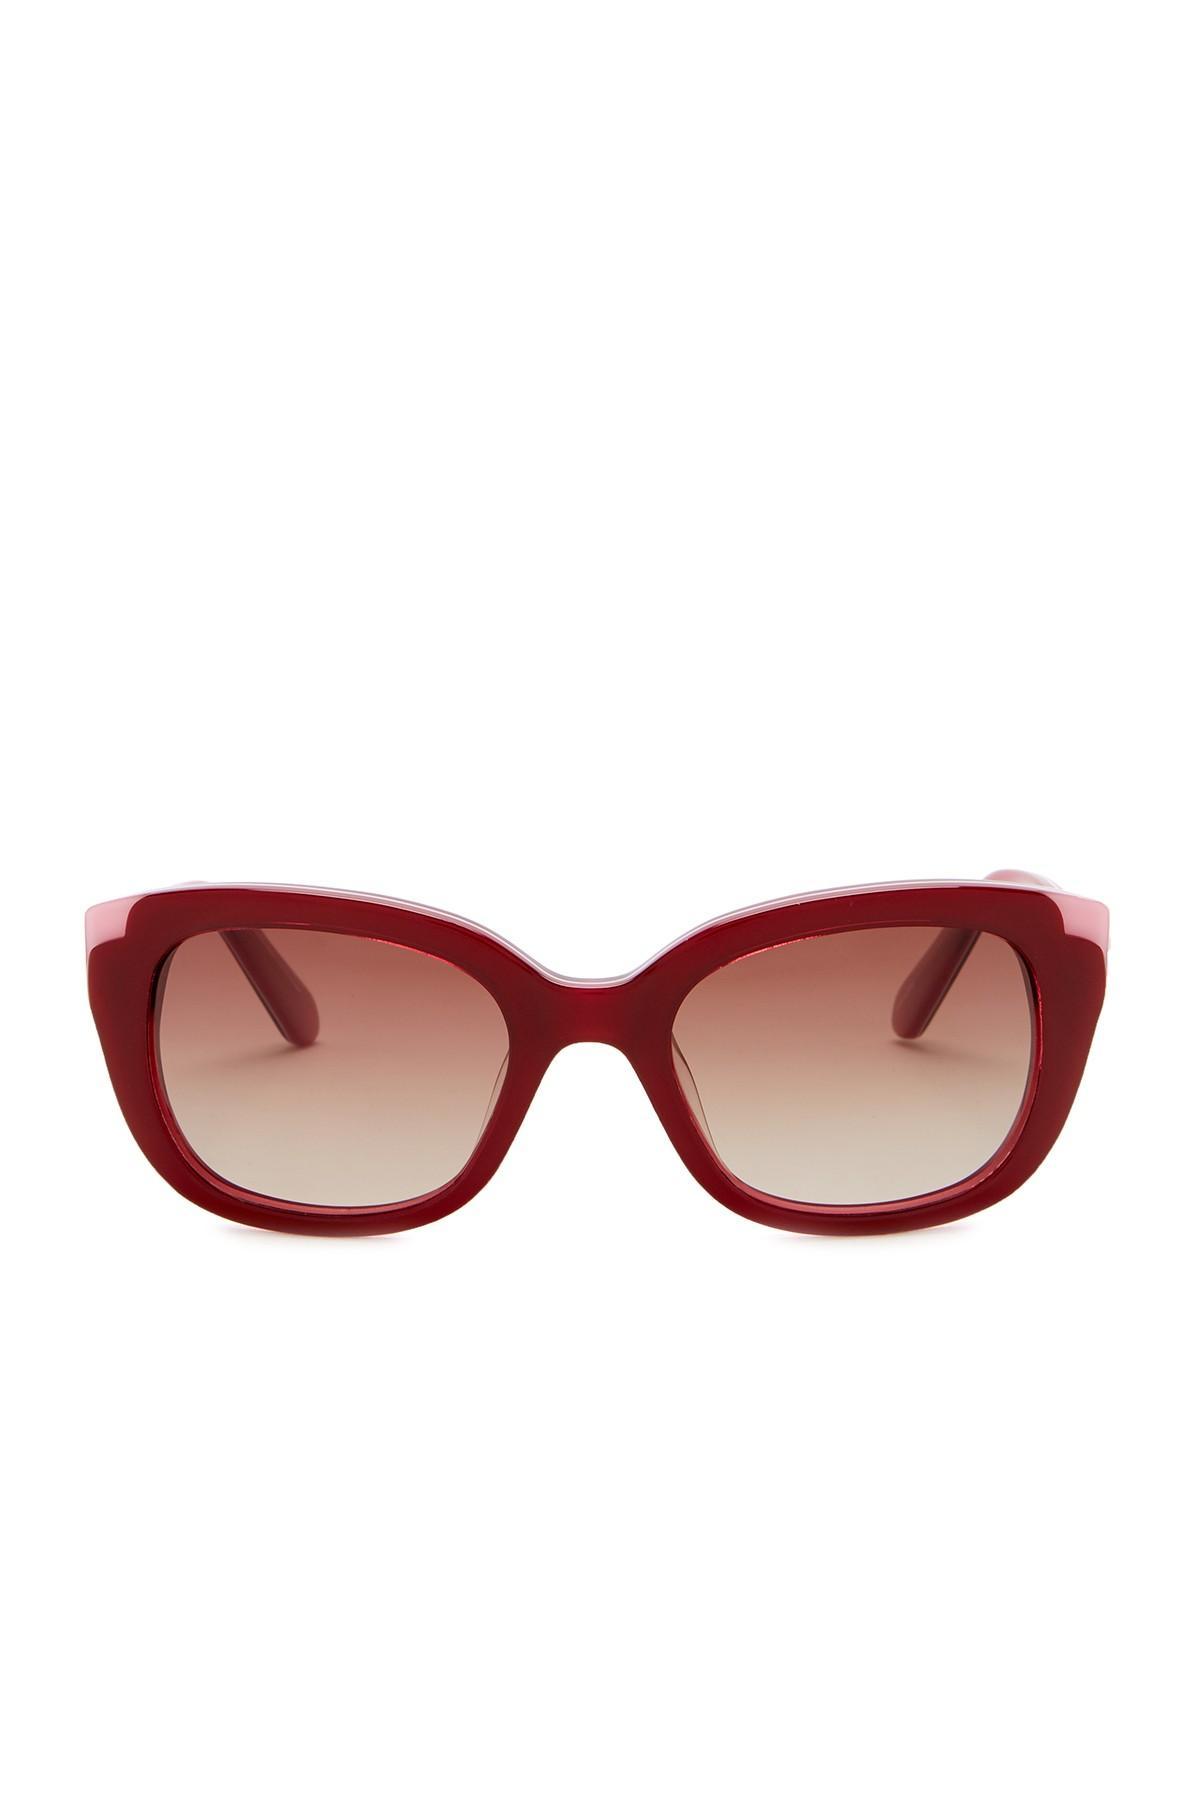 ef33d0defb621 Kate Spade. Women s Danella 50mm Square Cat Eye Sunglasses